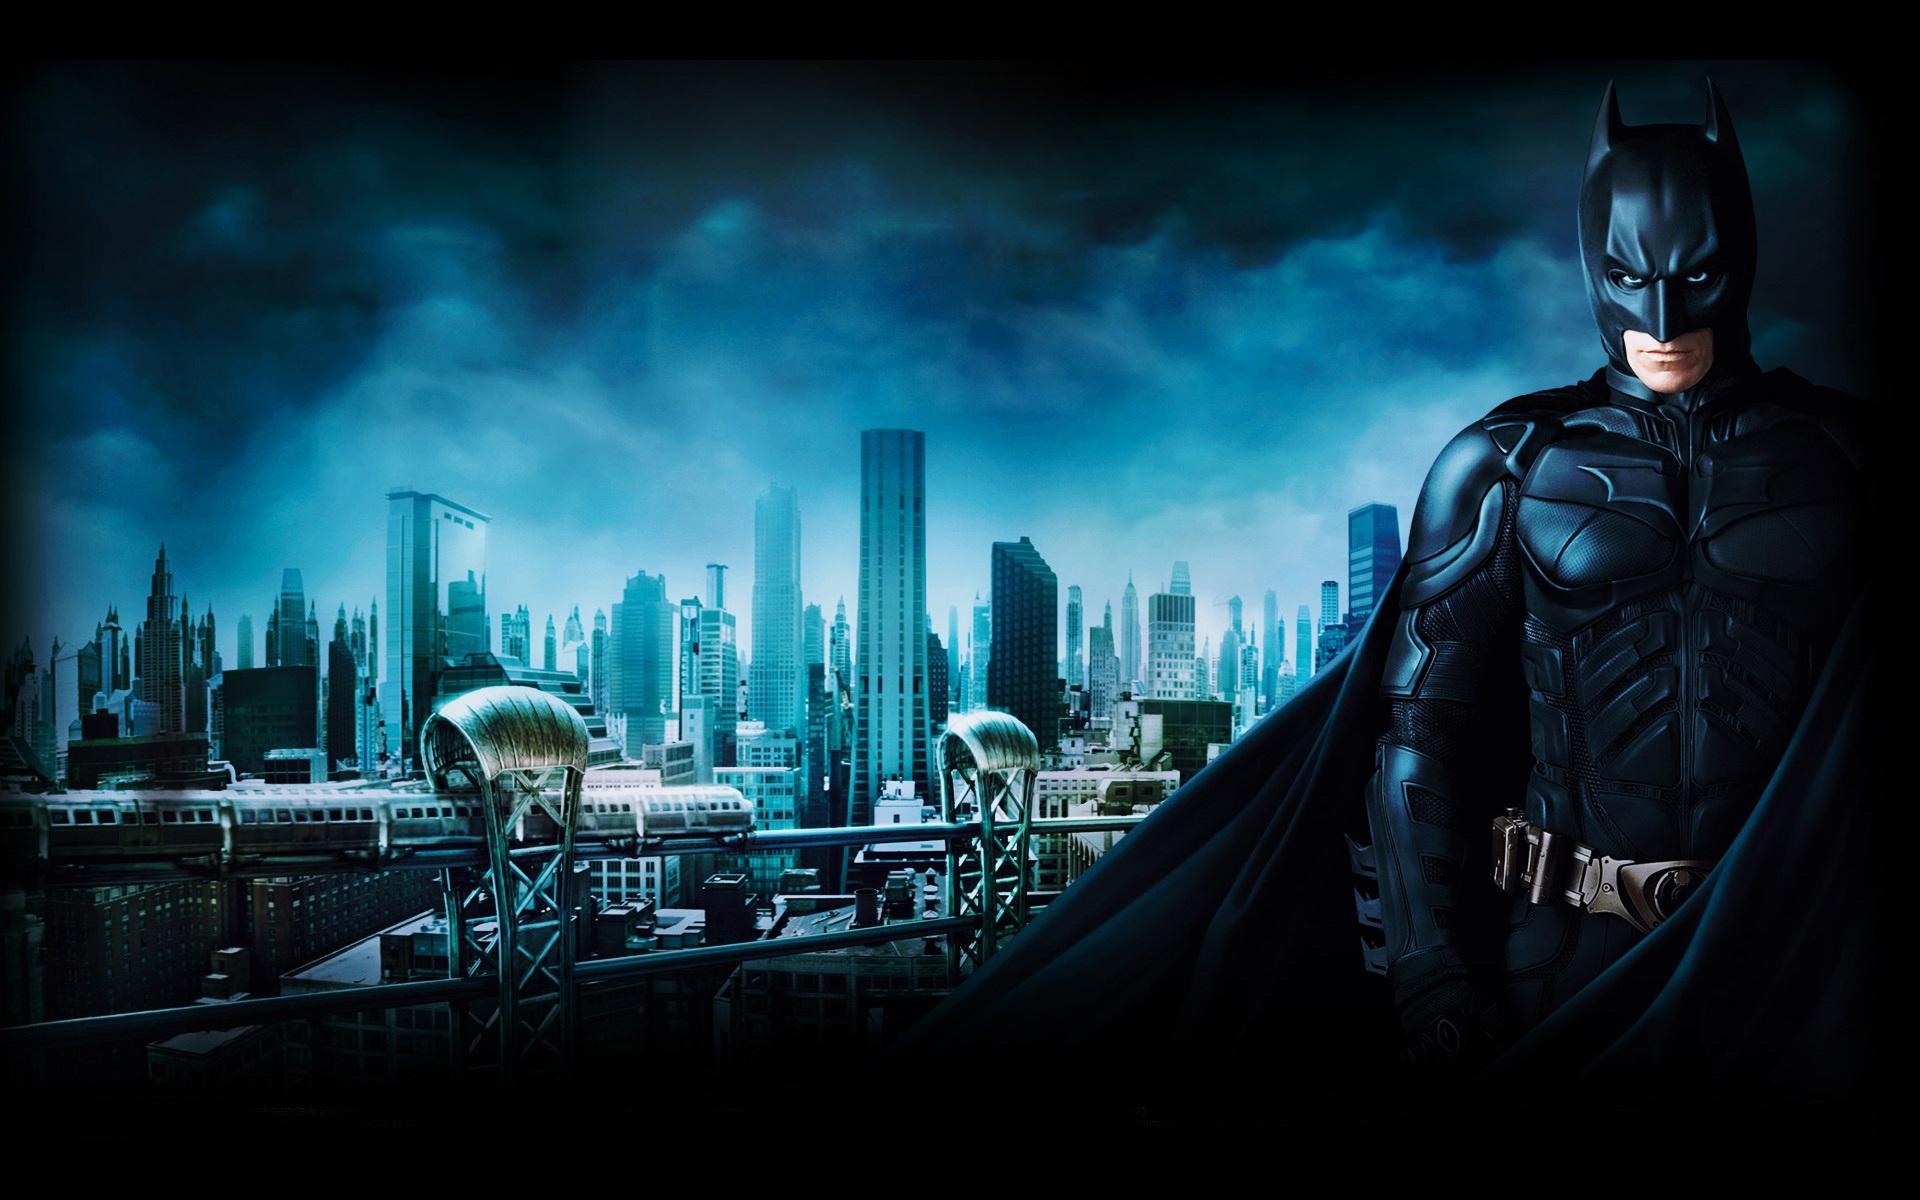 Batman Images Hd download on the digitalimagemakerworldcom 1920x1200